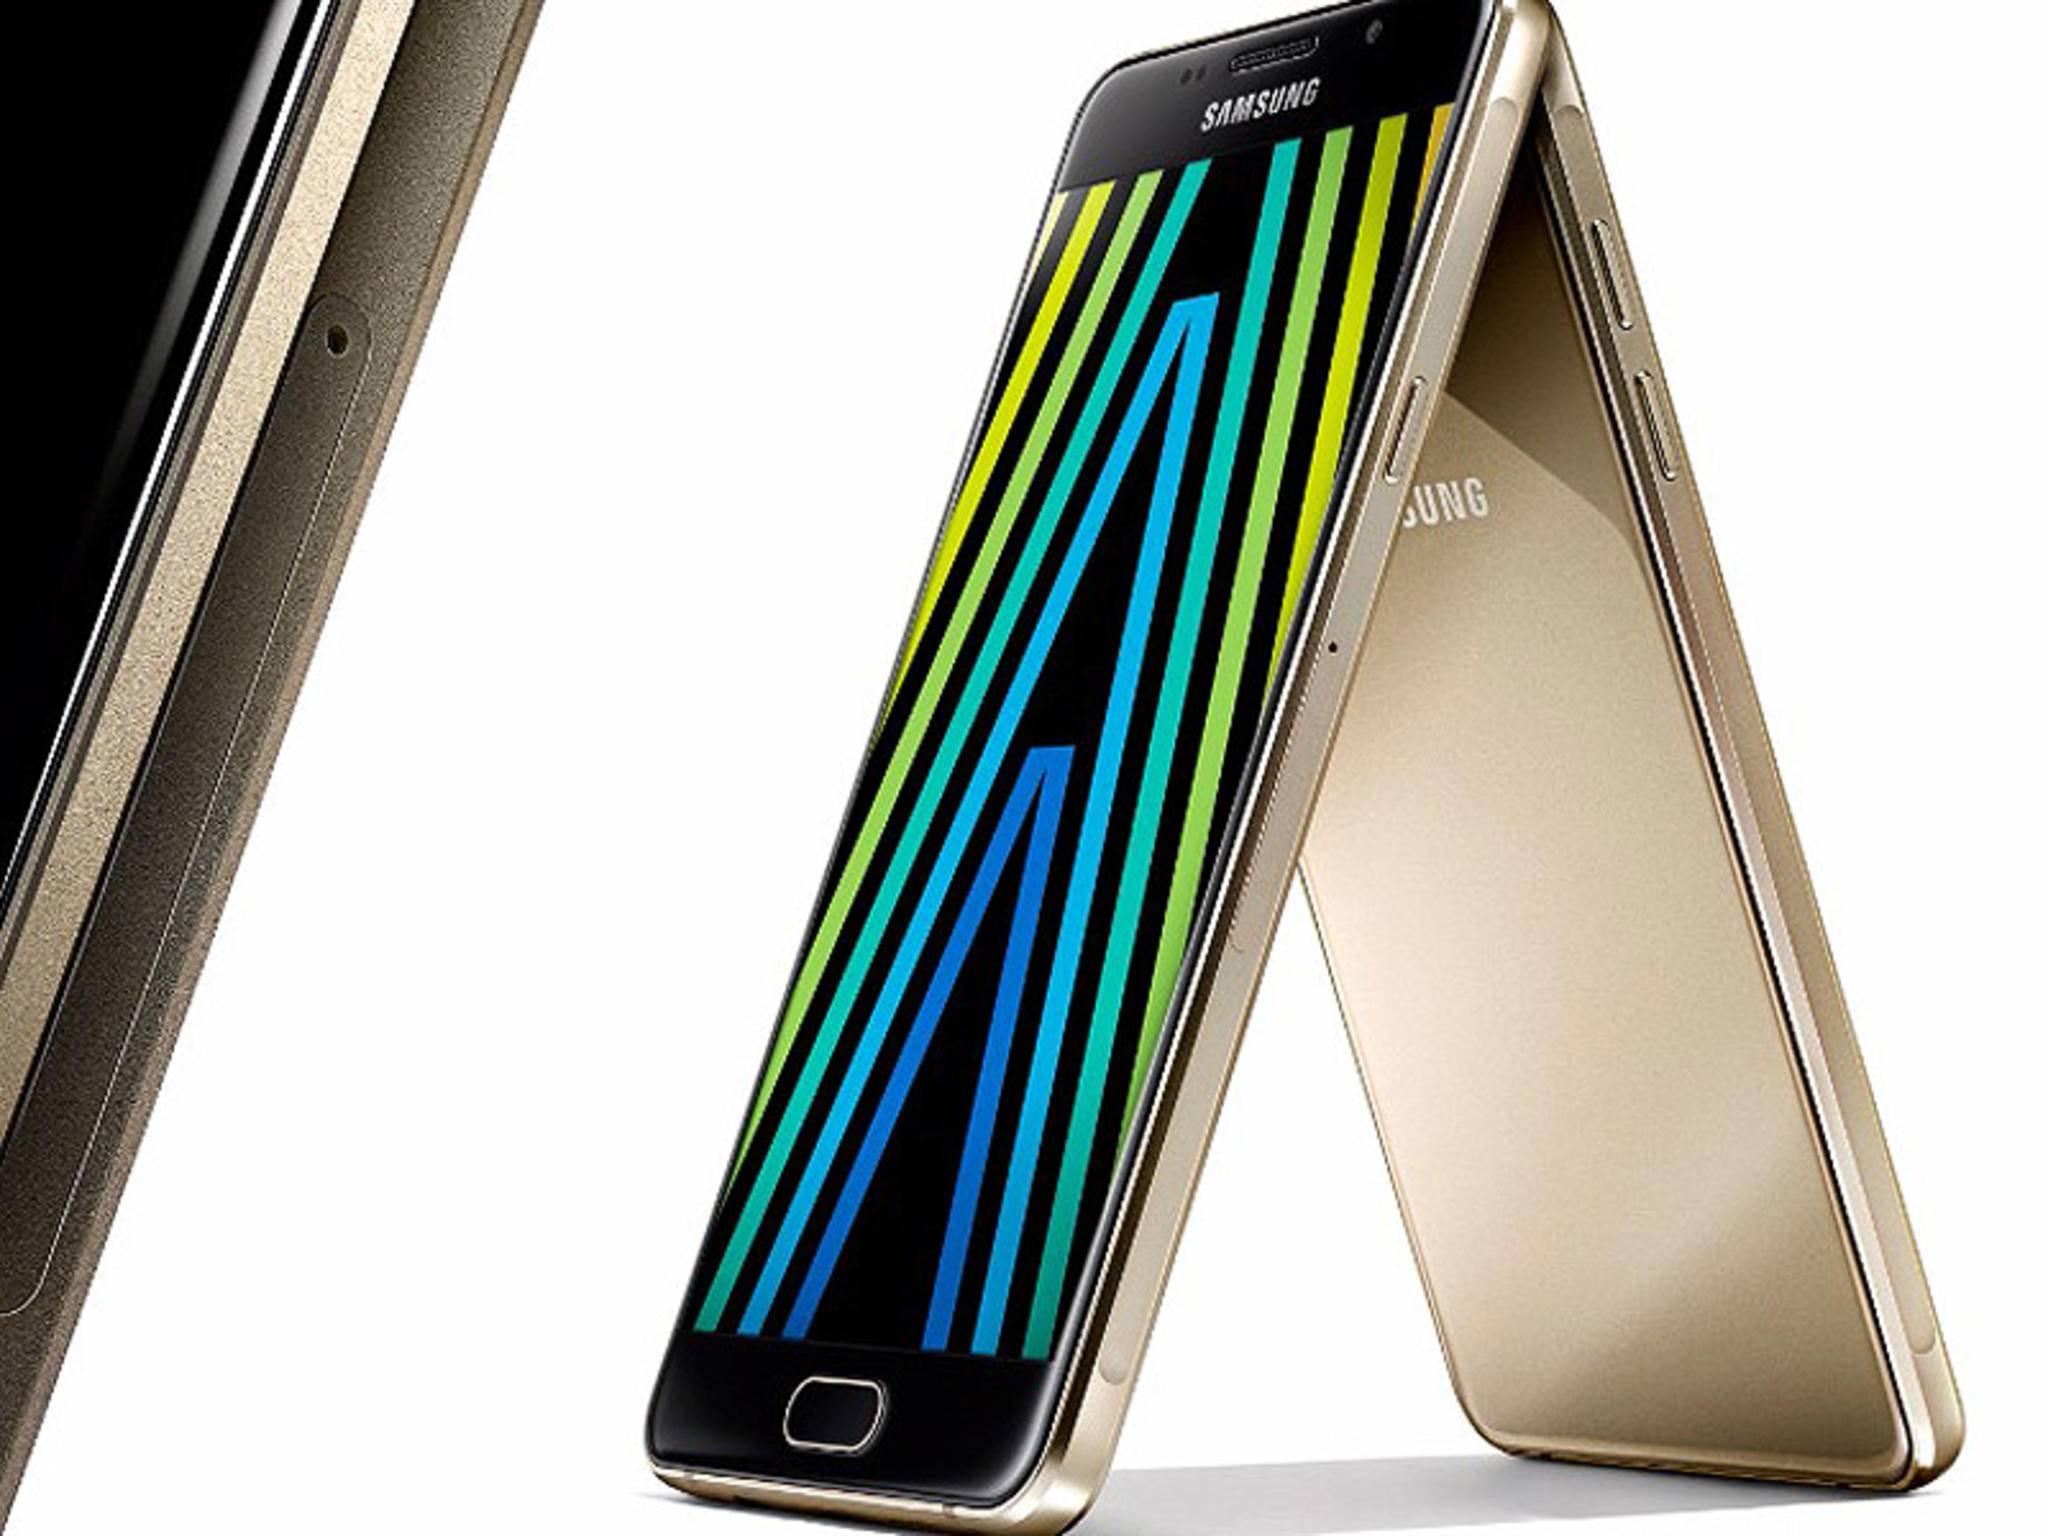 Das Galaxy A5 (2016) erscheint hierzulande Mitte Januar.